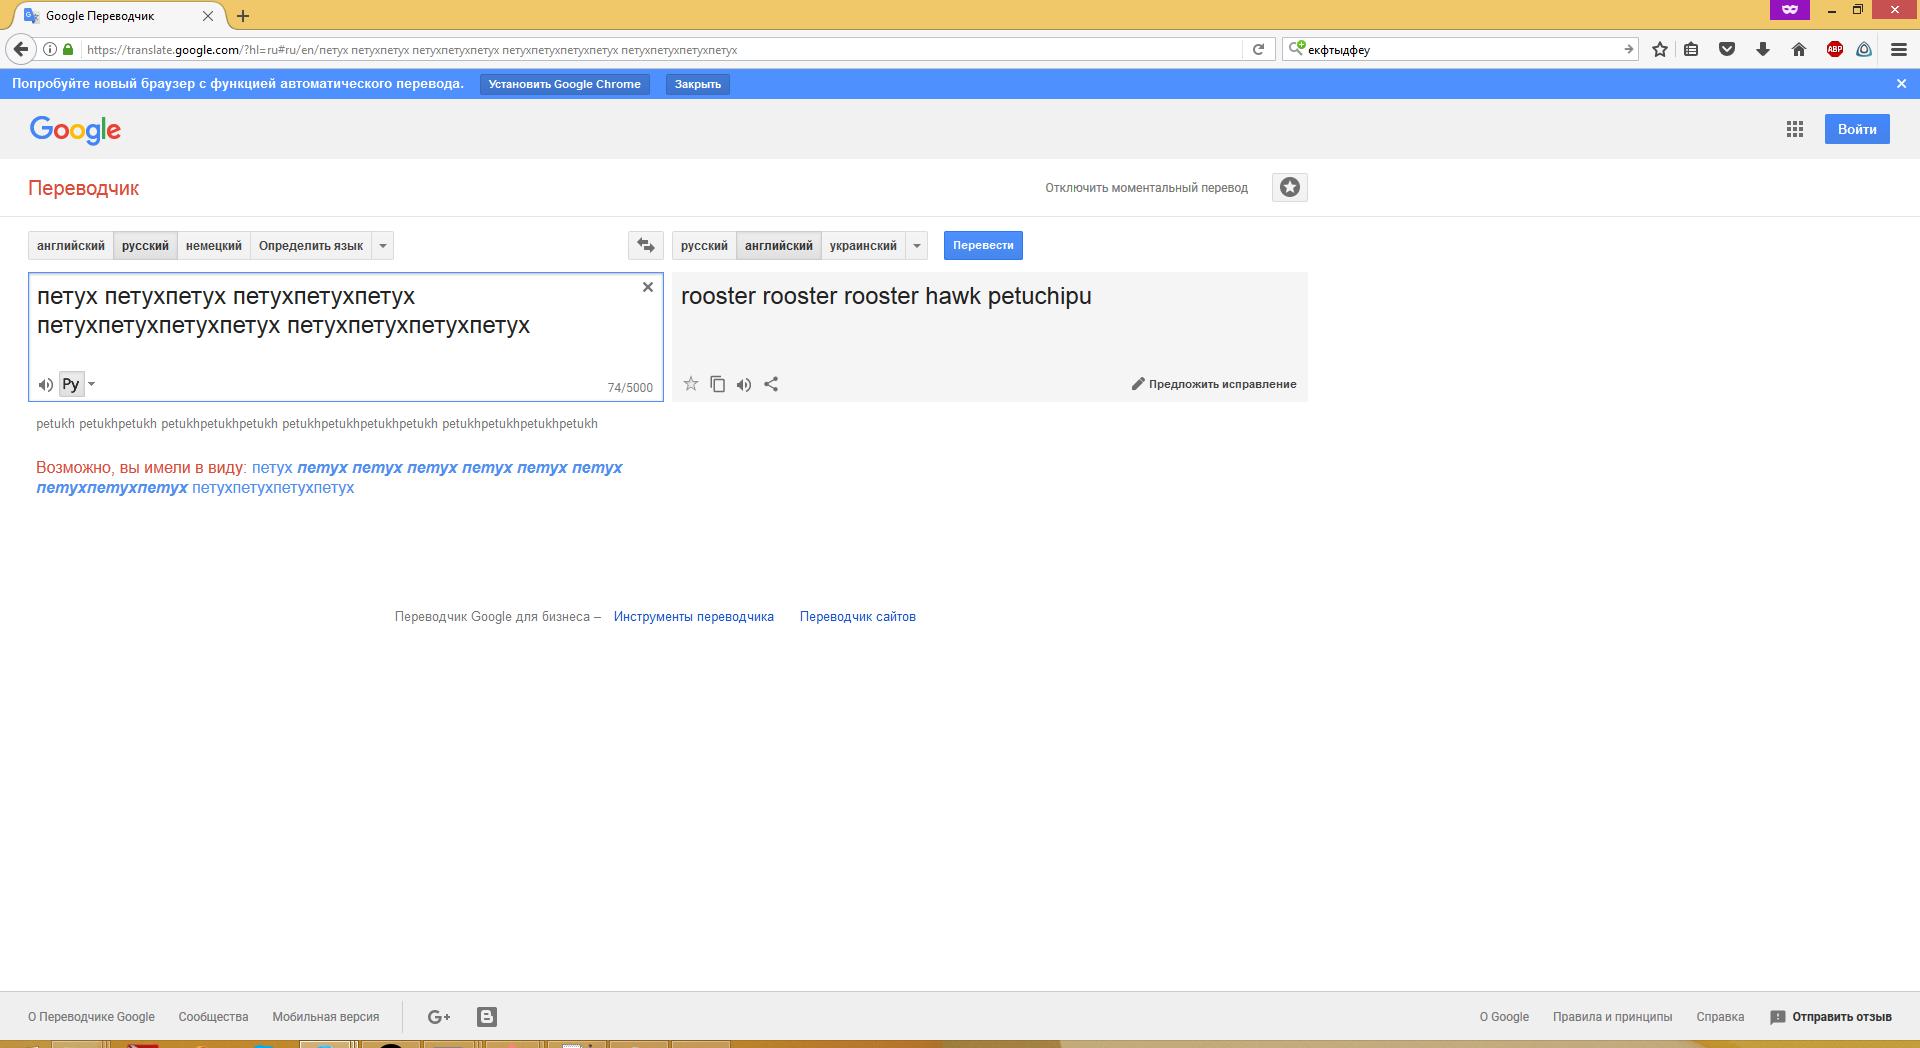 Screenshot 2017-09-02 21.24.24   FUN Google Ttranslate